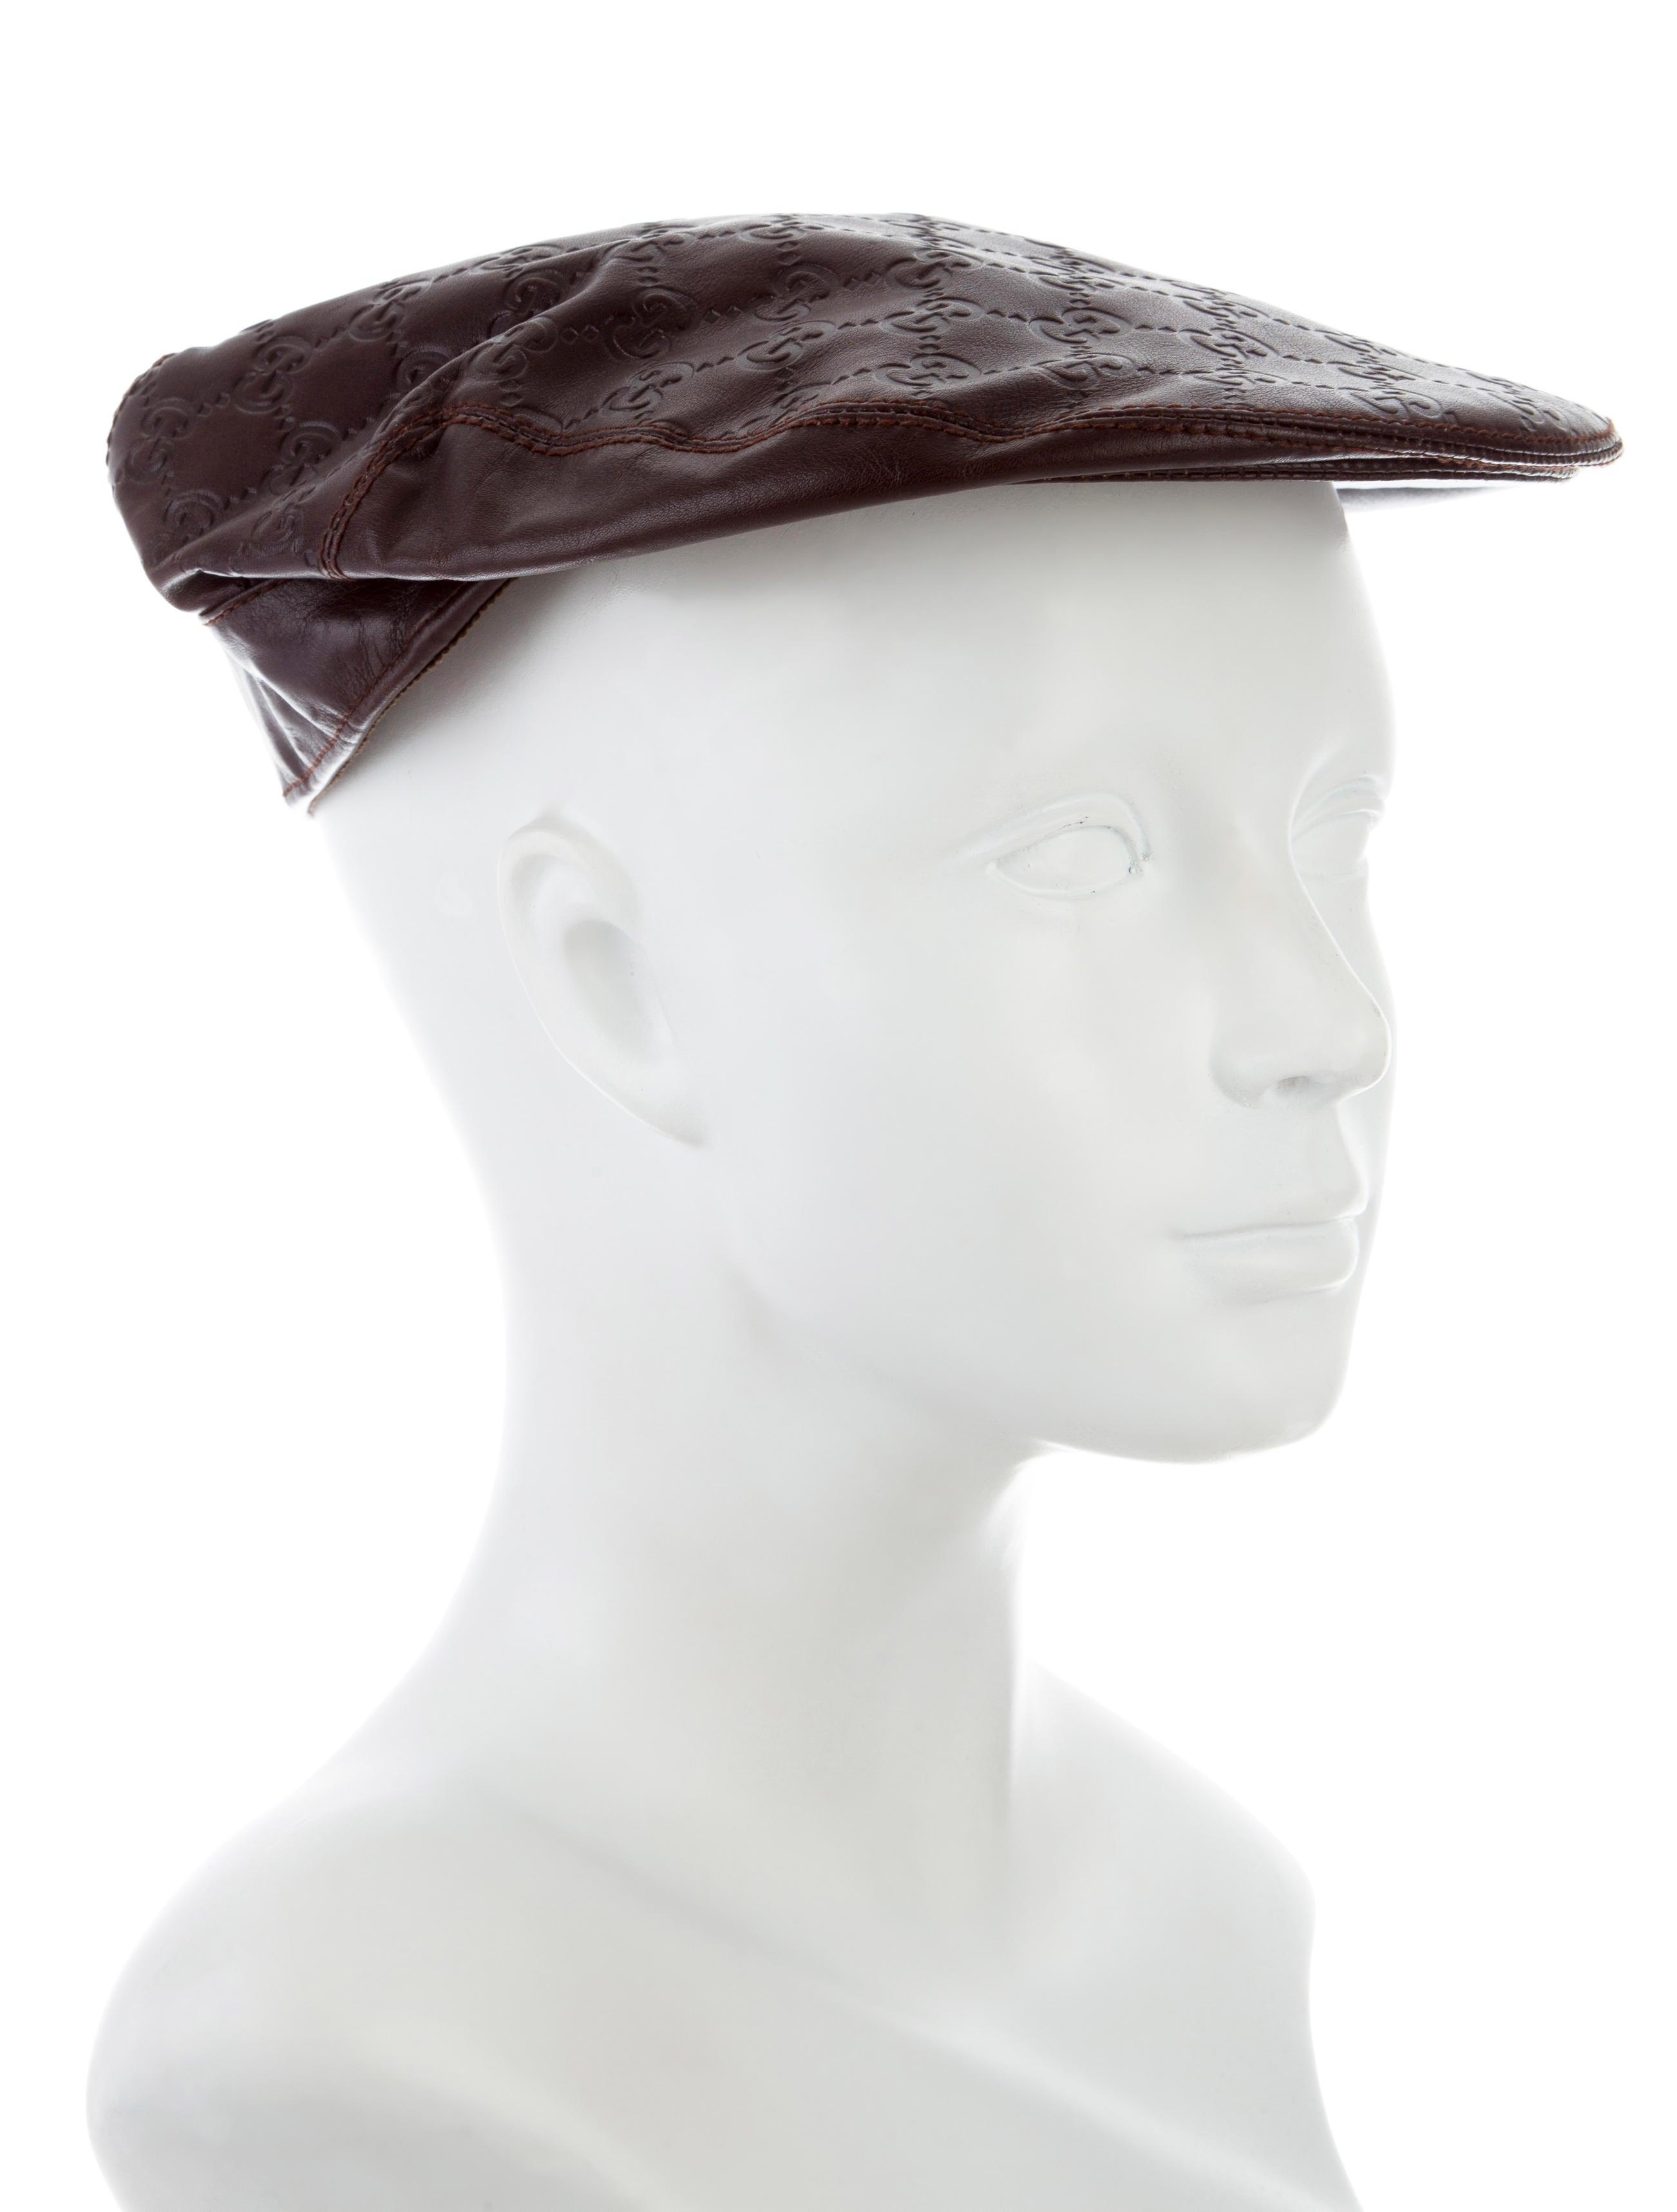 5be675917e350 Gucci Mens Newsboy Hat